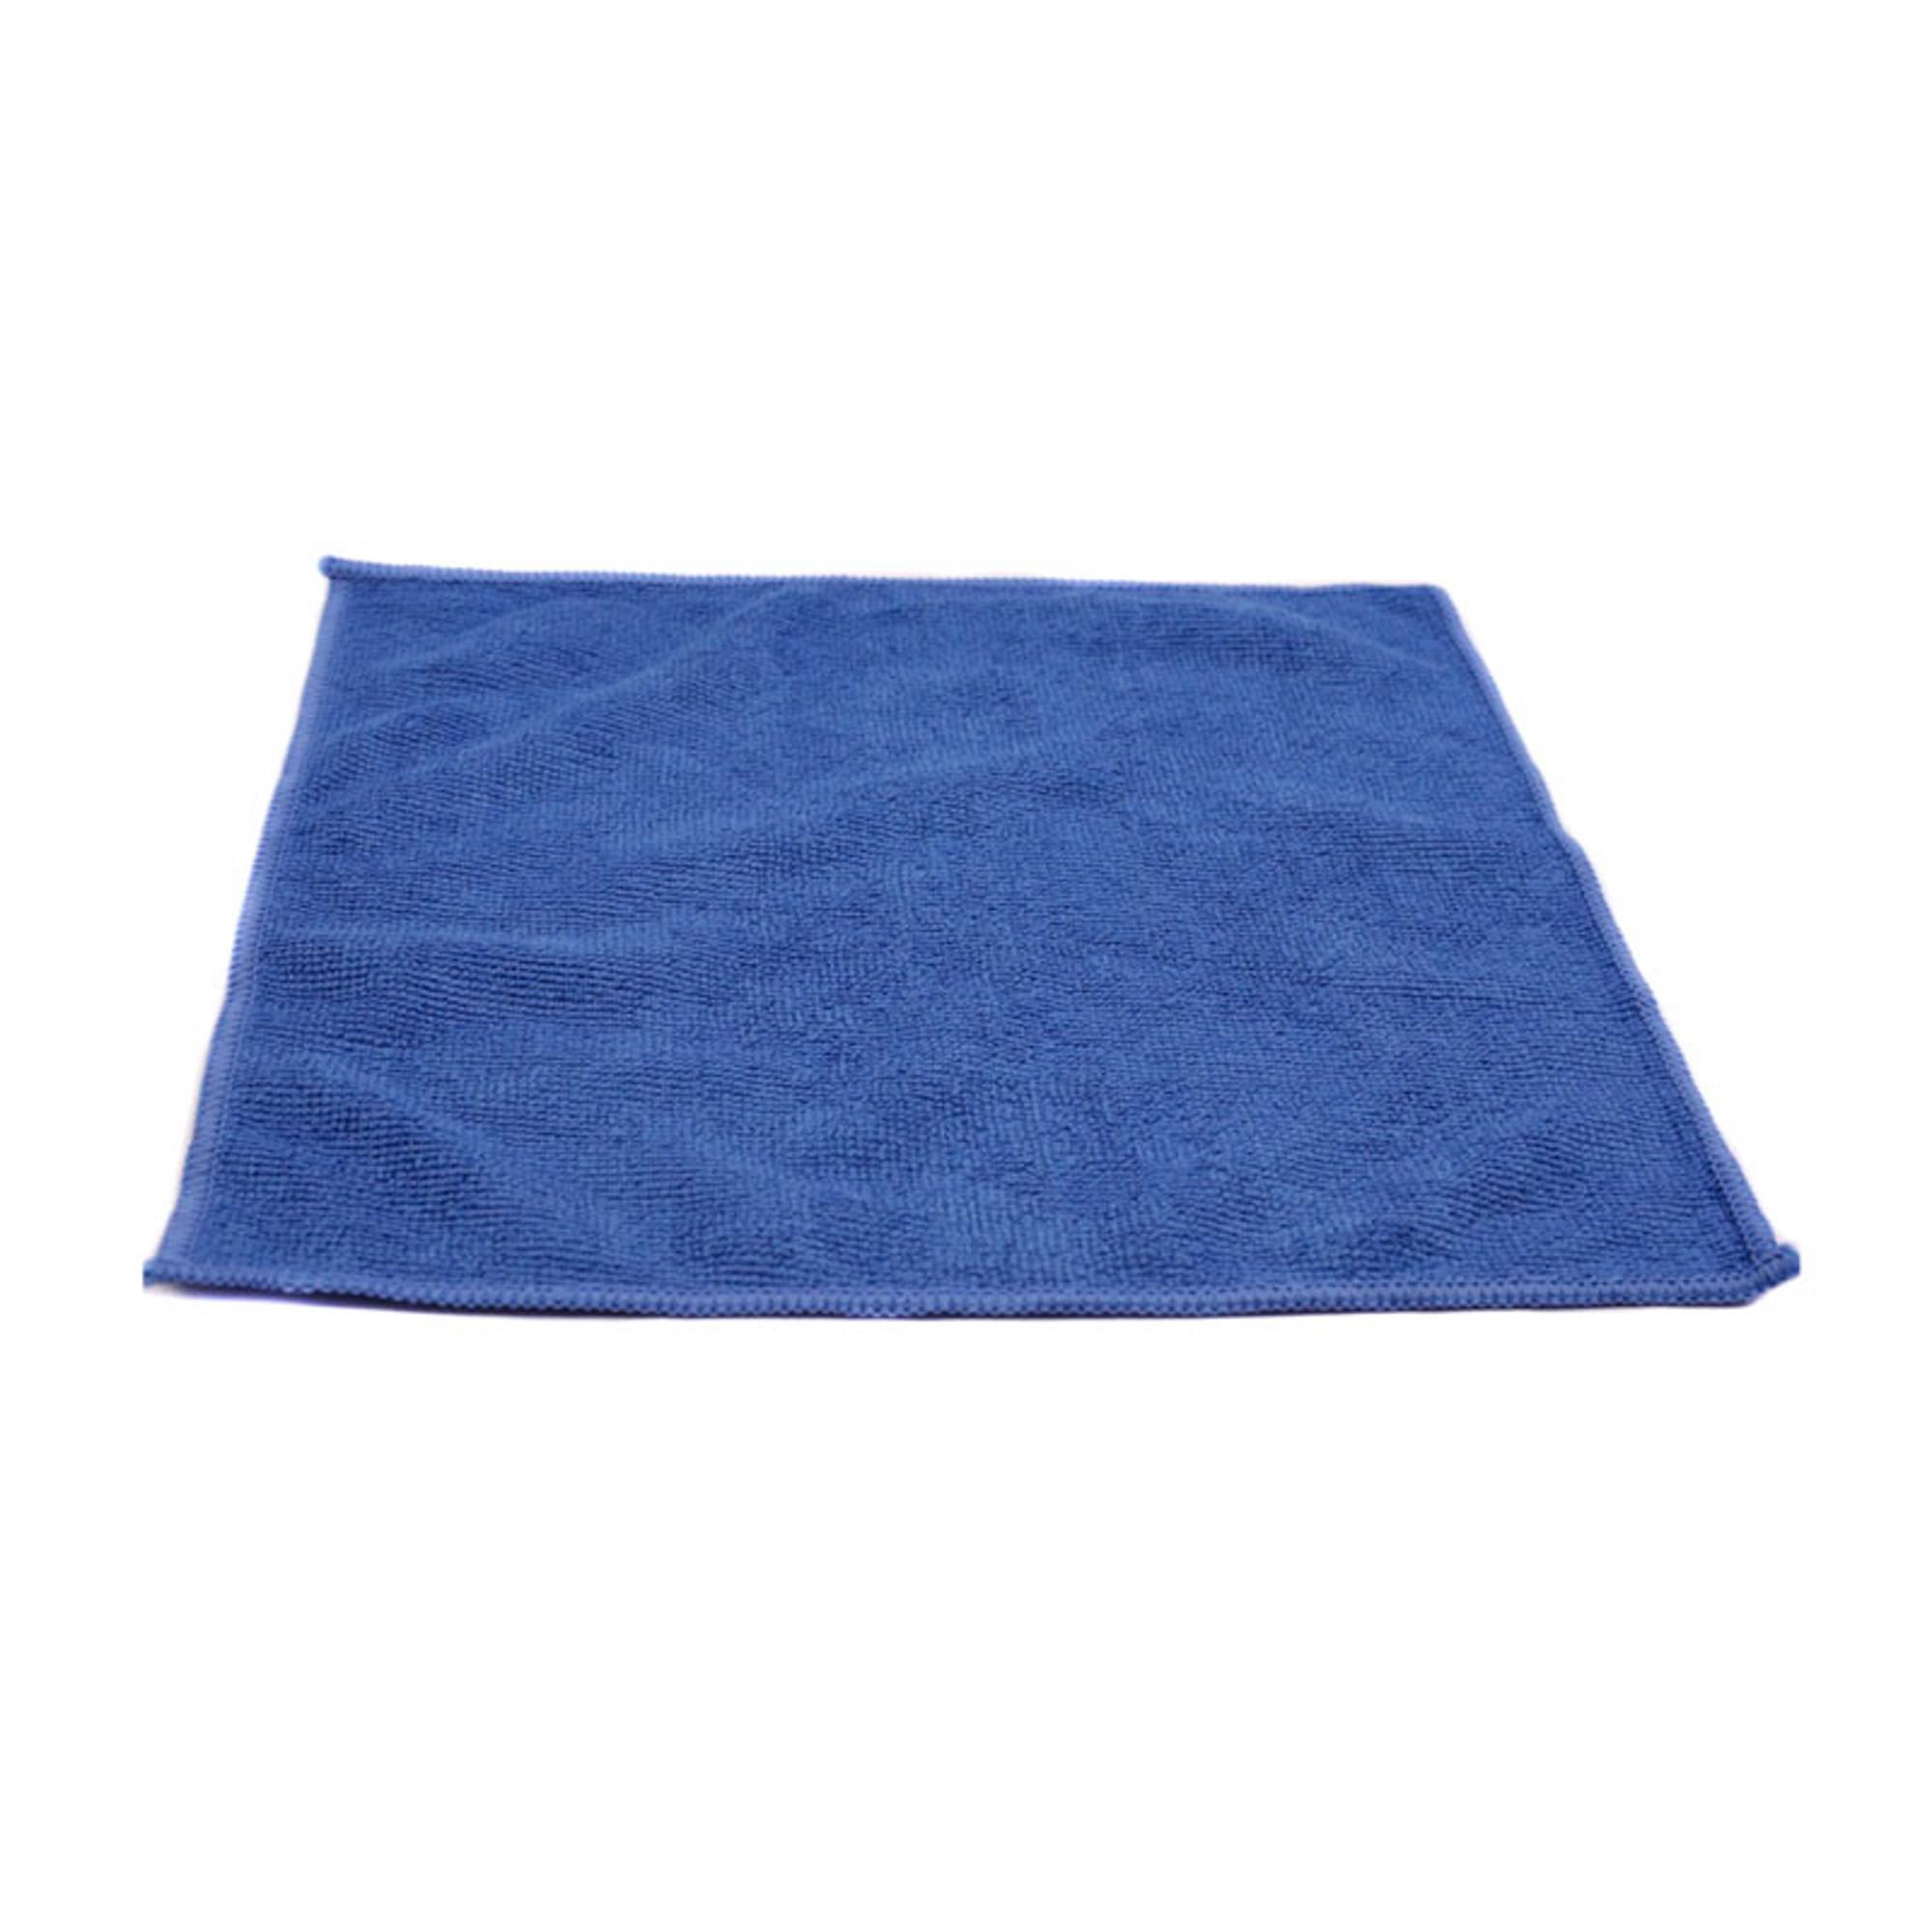 Салфетка 29х29см, микрофибра, 220г/м2, синяя, без упаковки